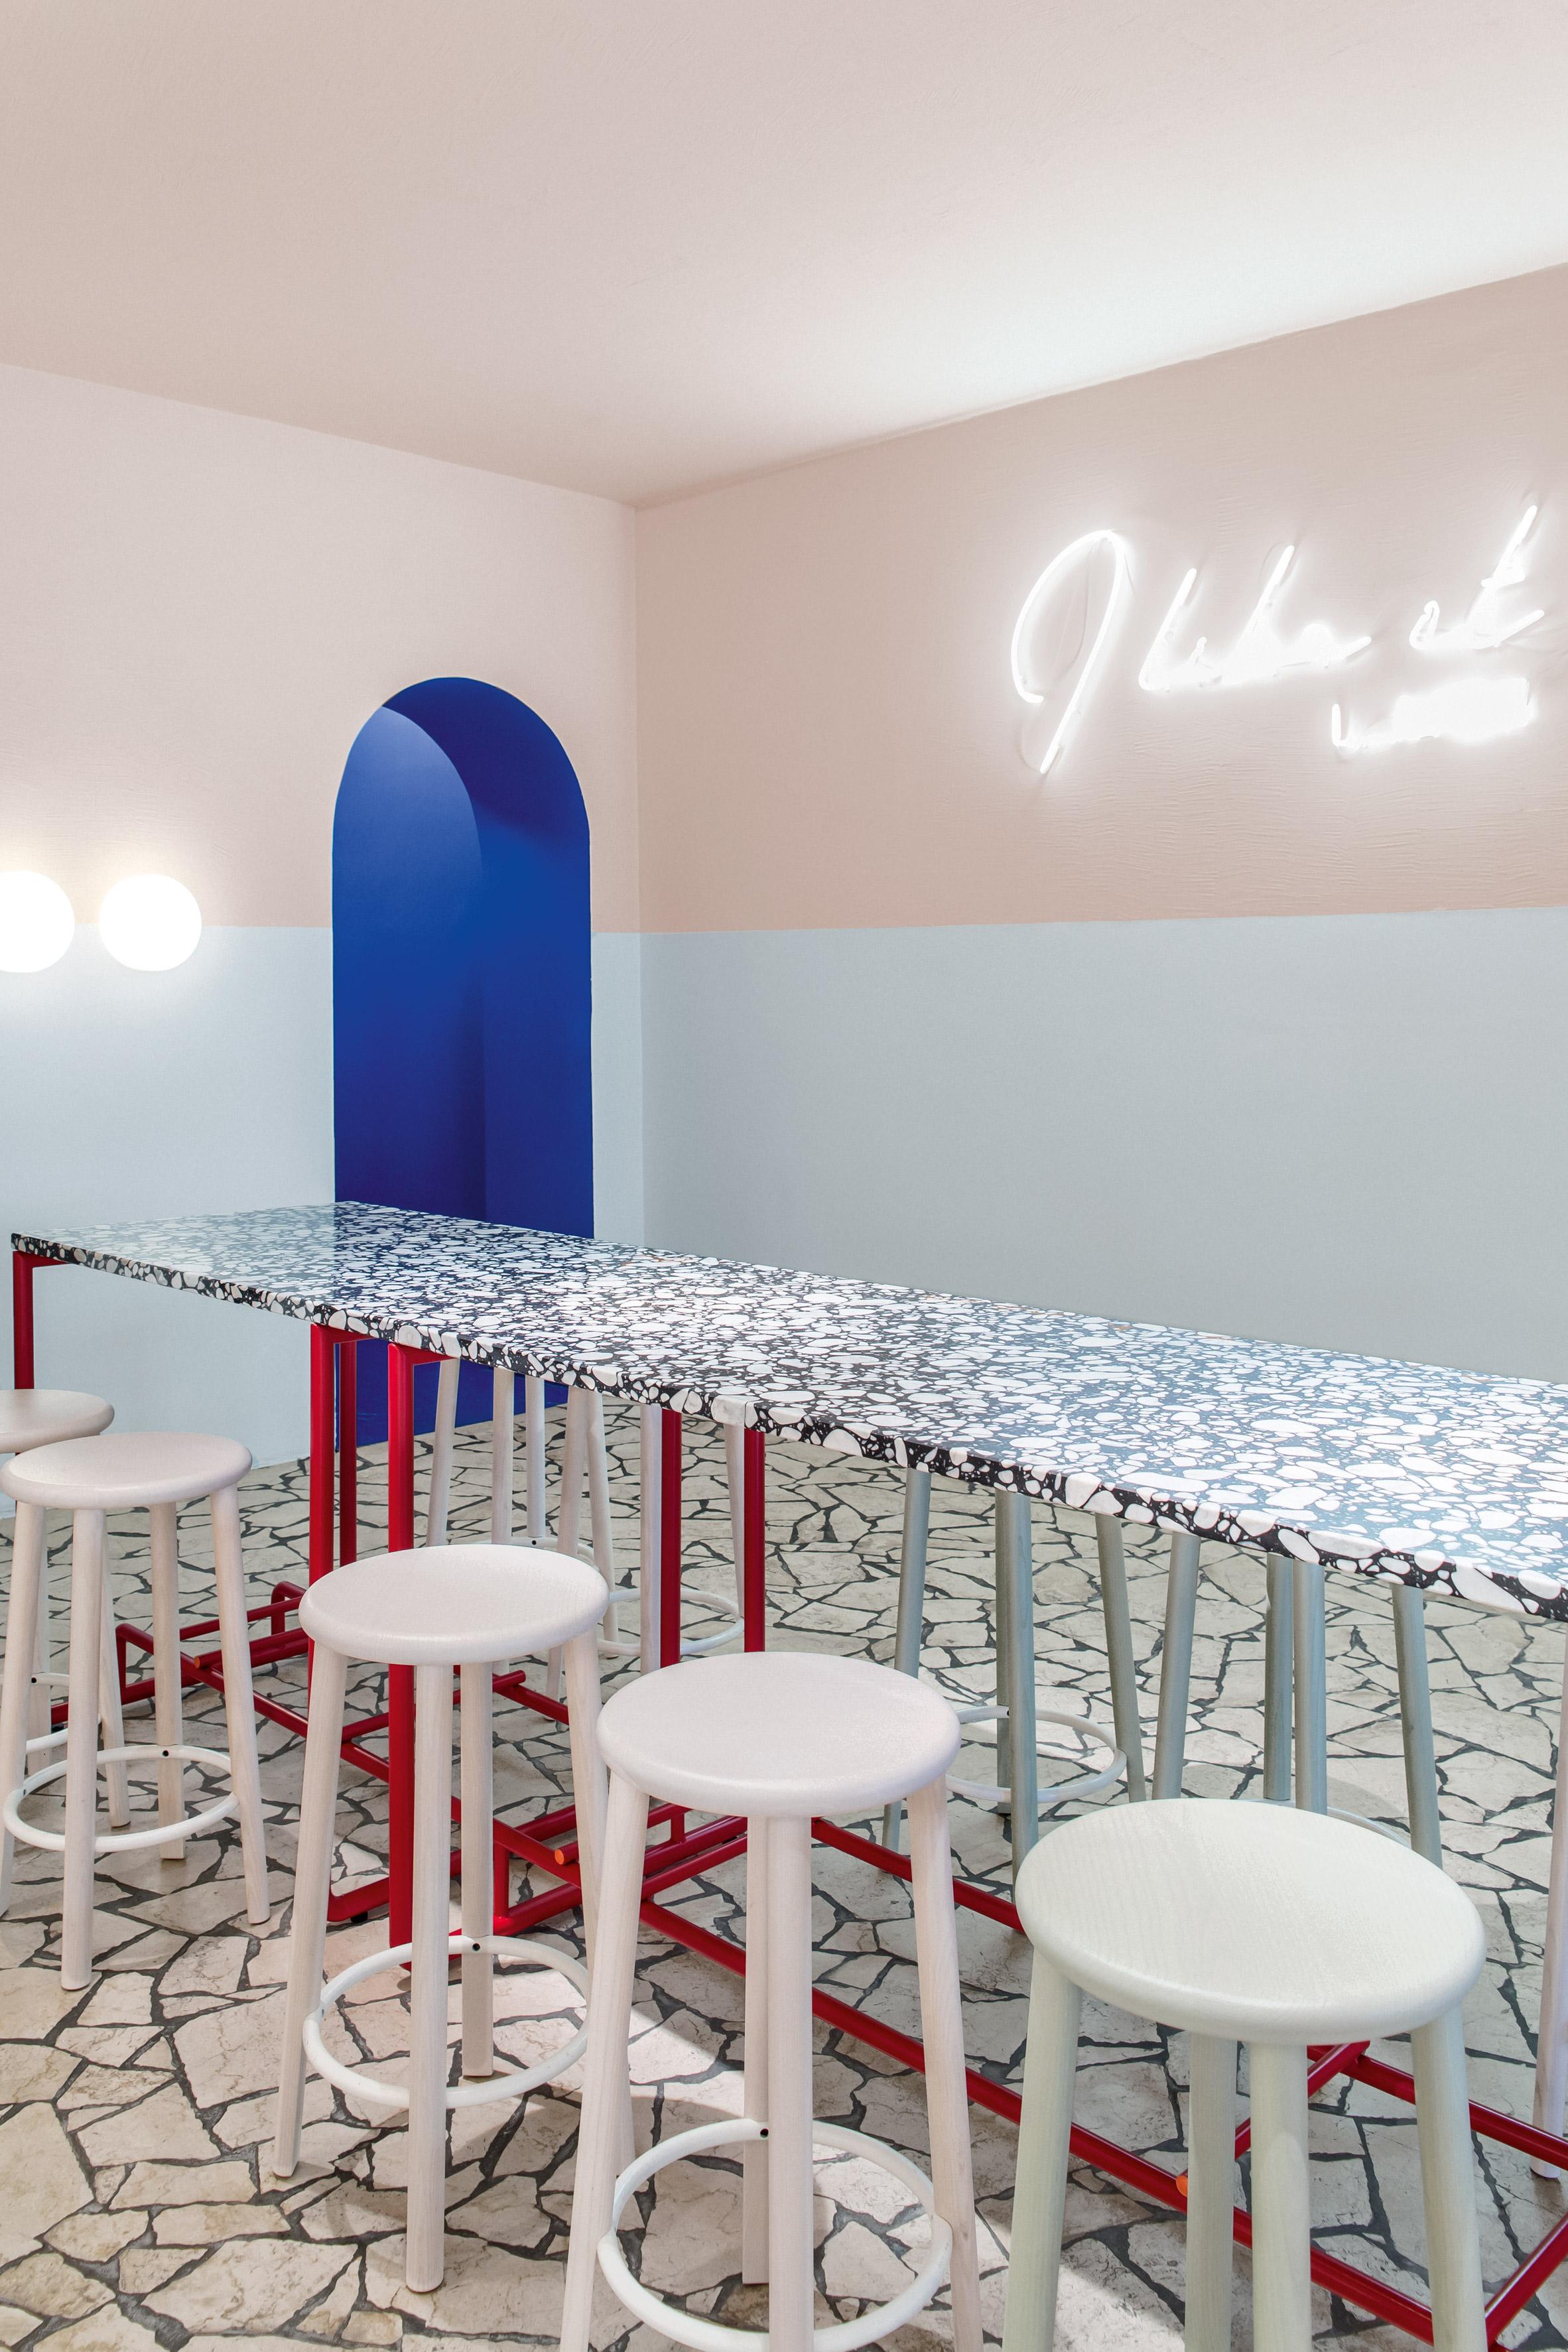 la-poke-restaurant-ester-bruzkus-interiors_dezainaa_4